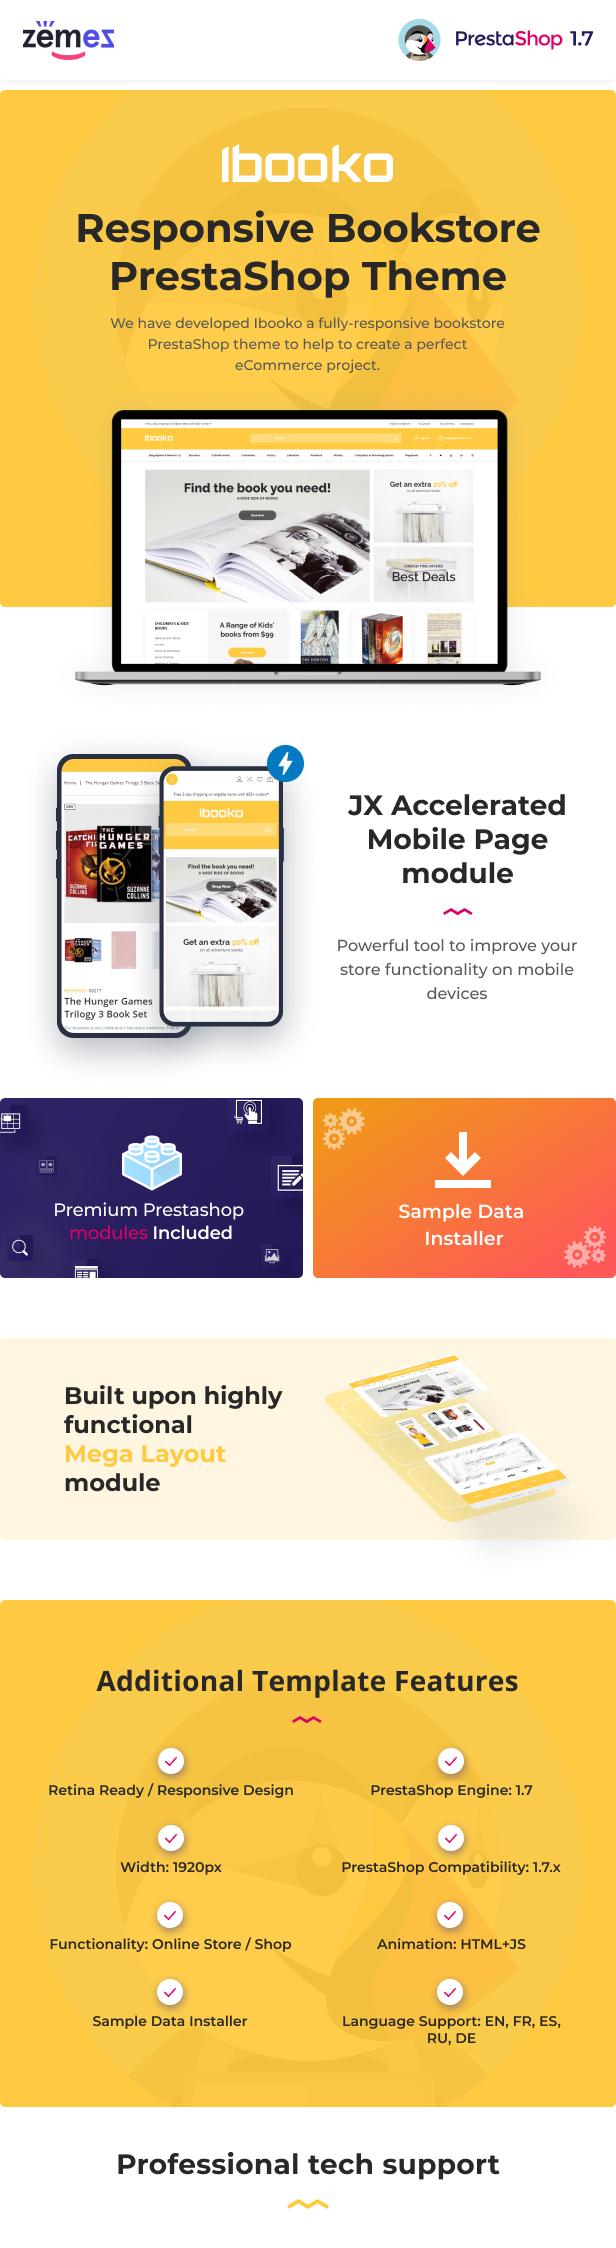 Ibooko - Responsive Bookstore PrestaShop Theme - 1